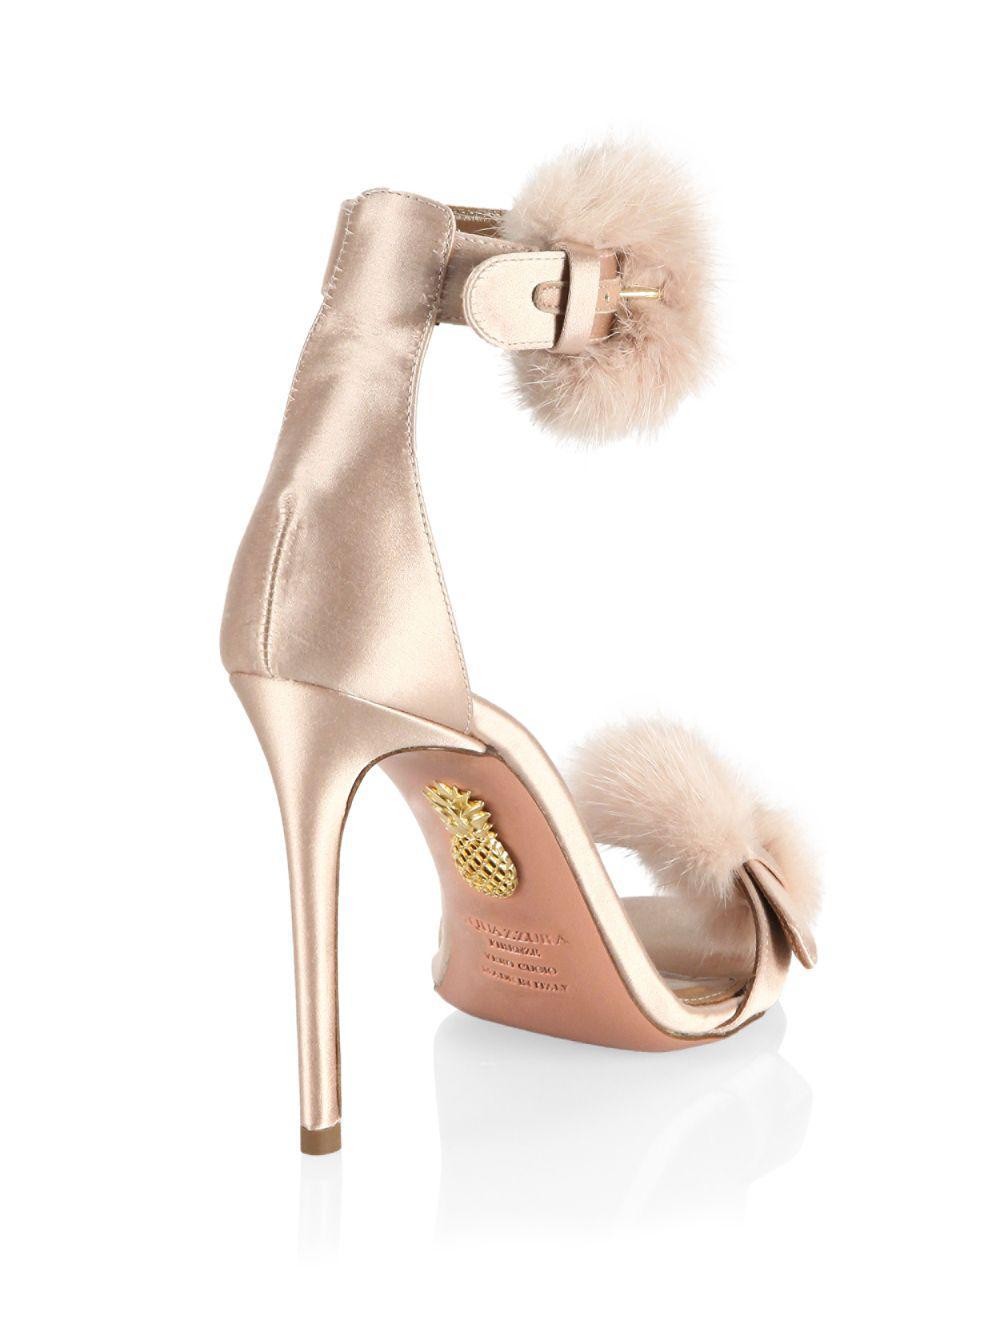 70548a71c20 Lyst - Aquazzura Sinatra Satin   Mink Sandals - Save 10%